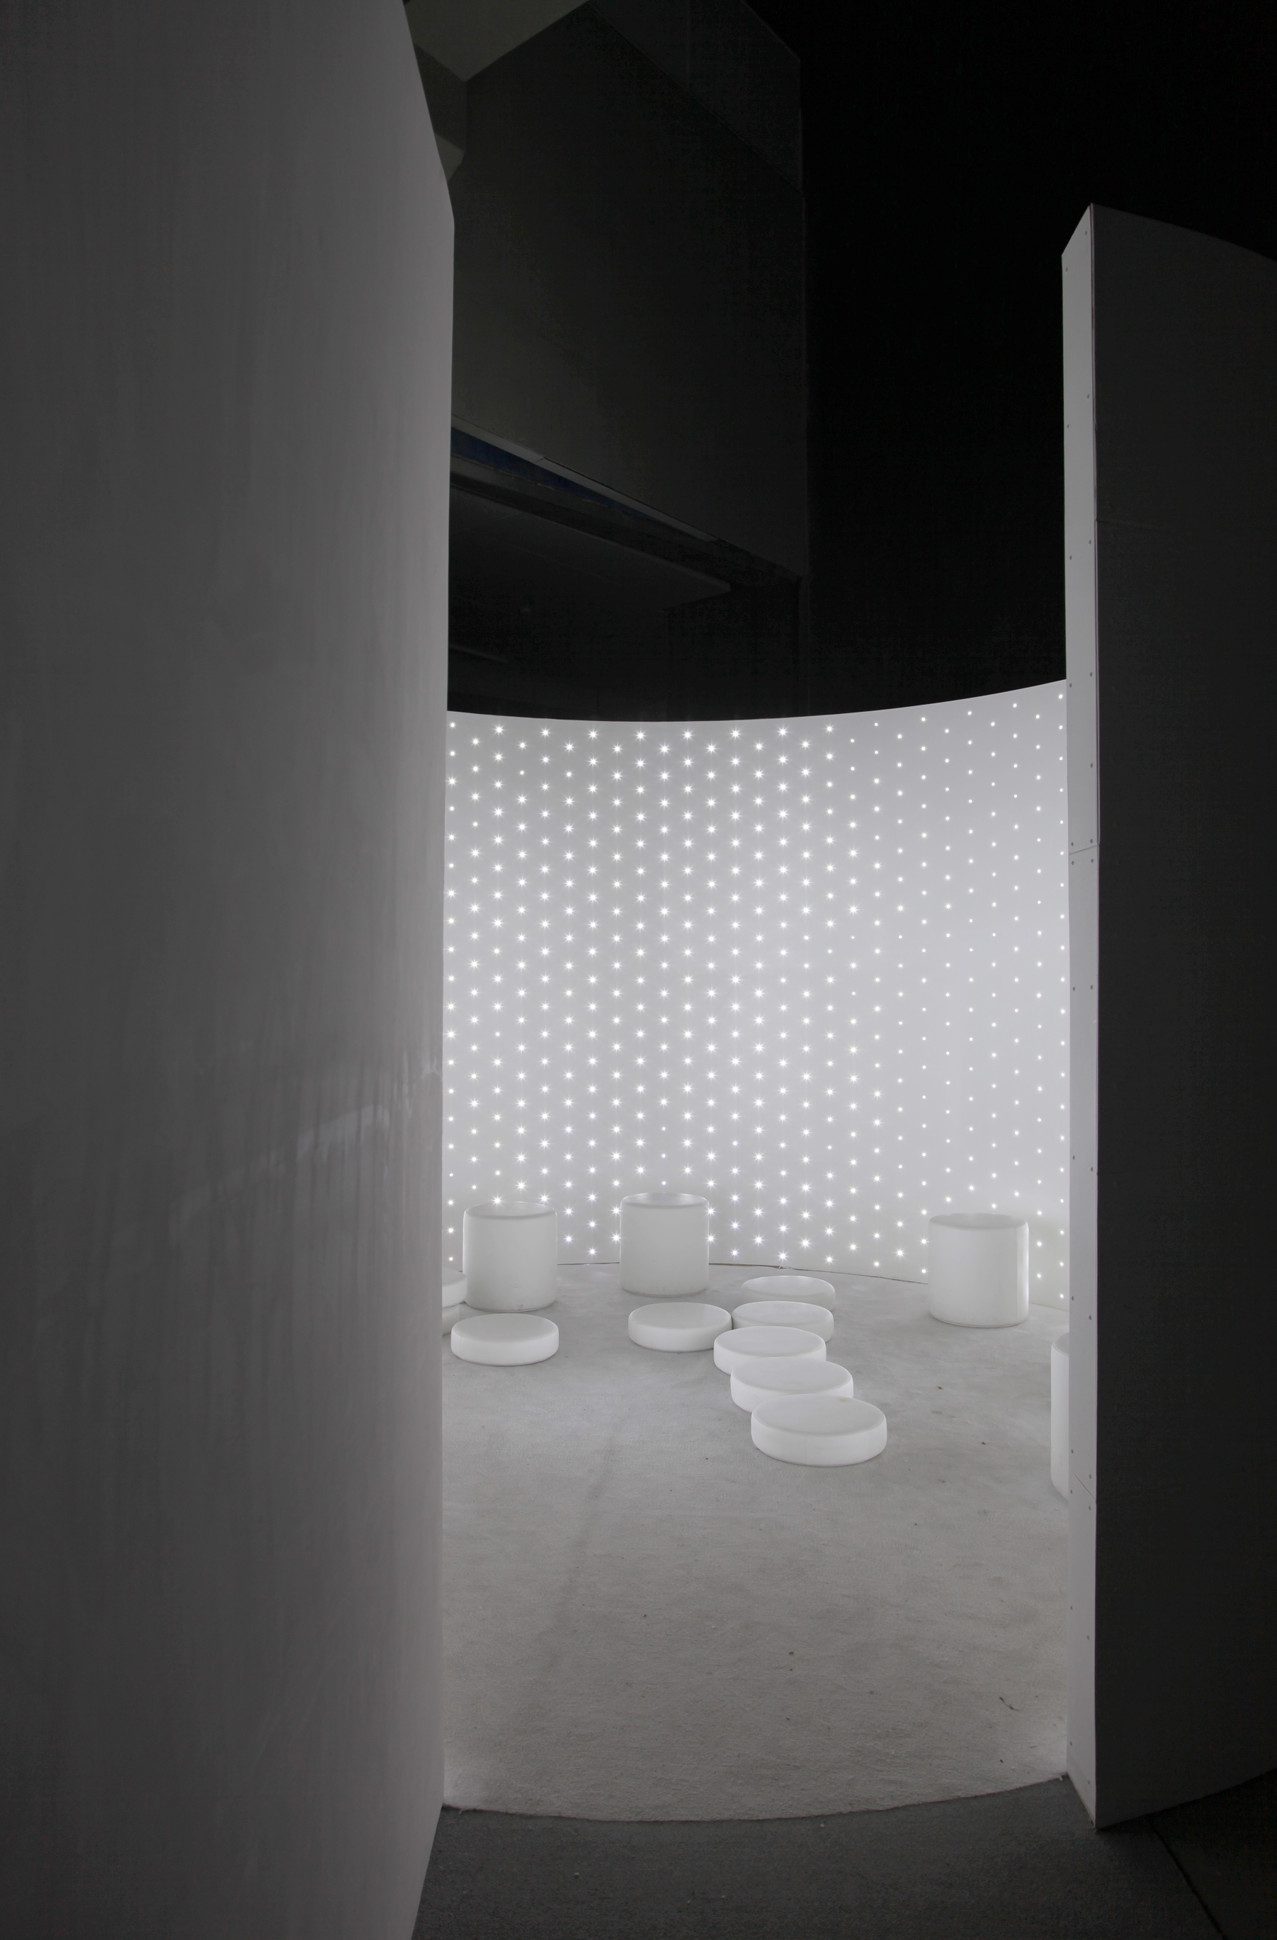 Disorientation Station (White), 2016